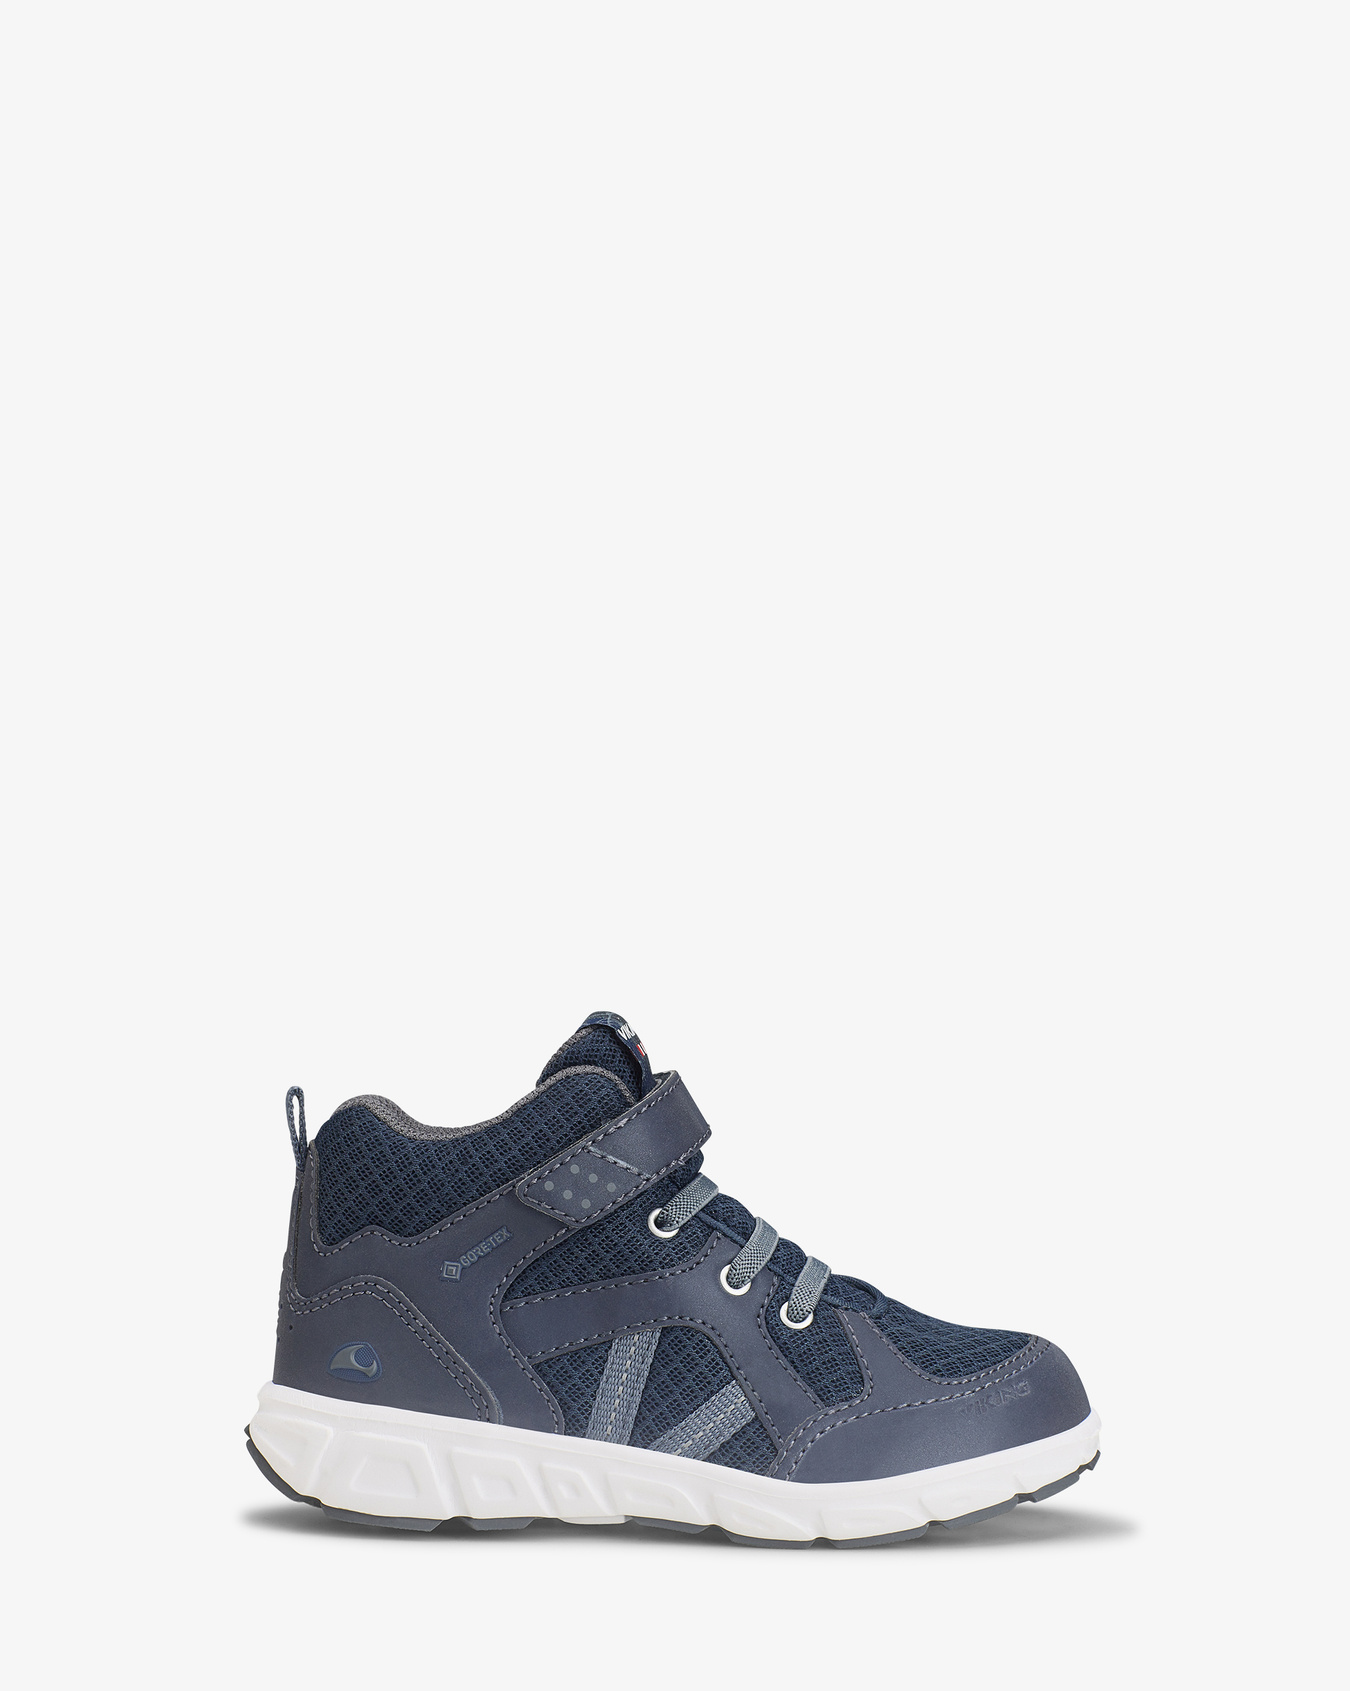 Alvdal Mid R GTX Navy Charcoal Sneaker